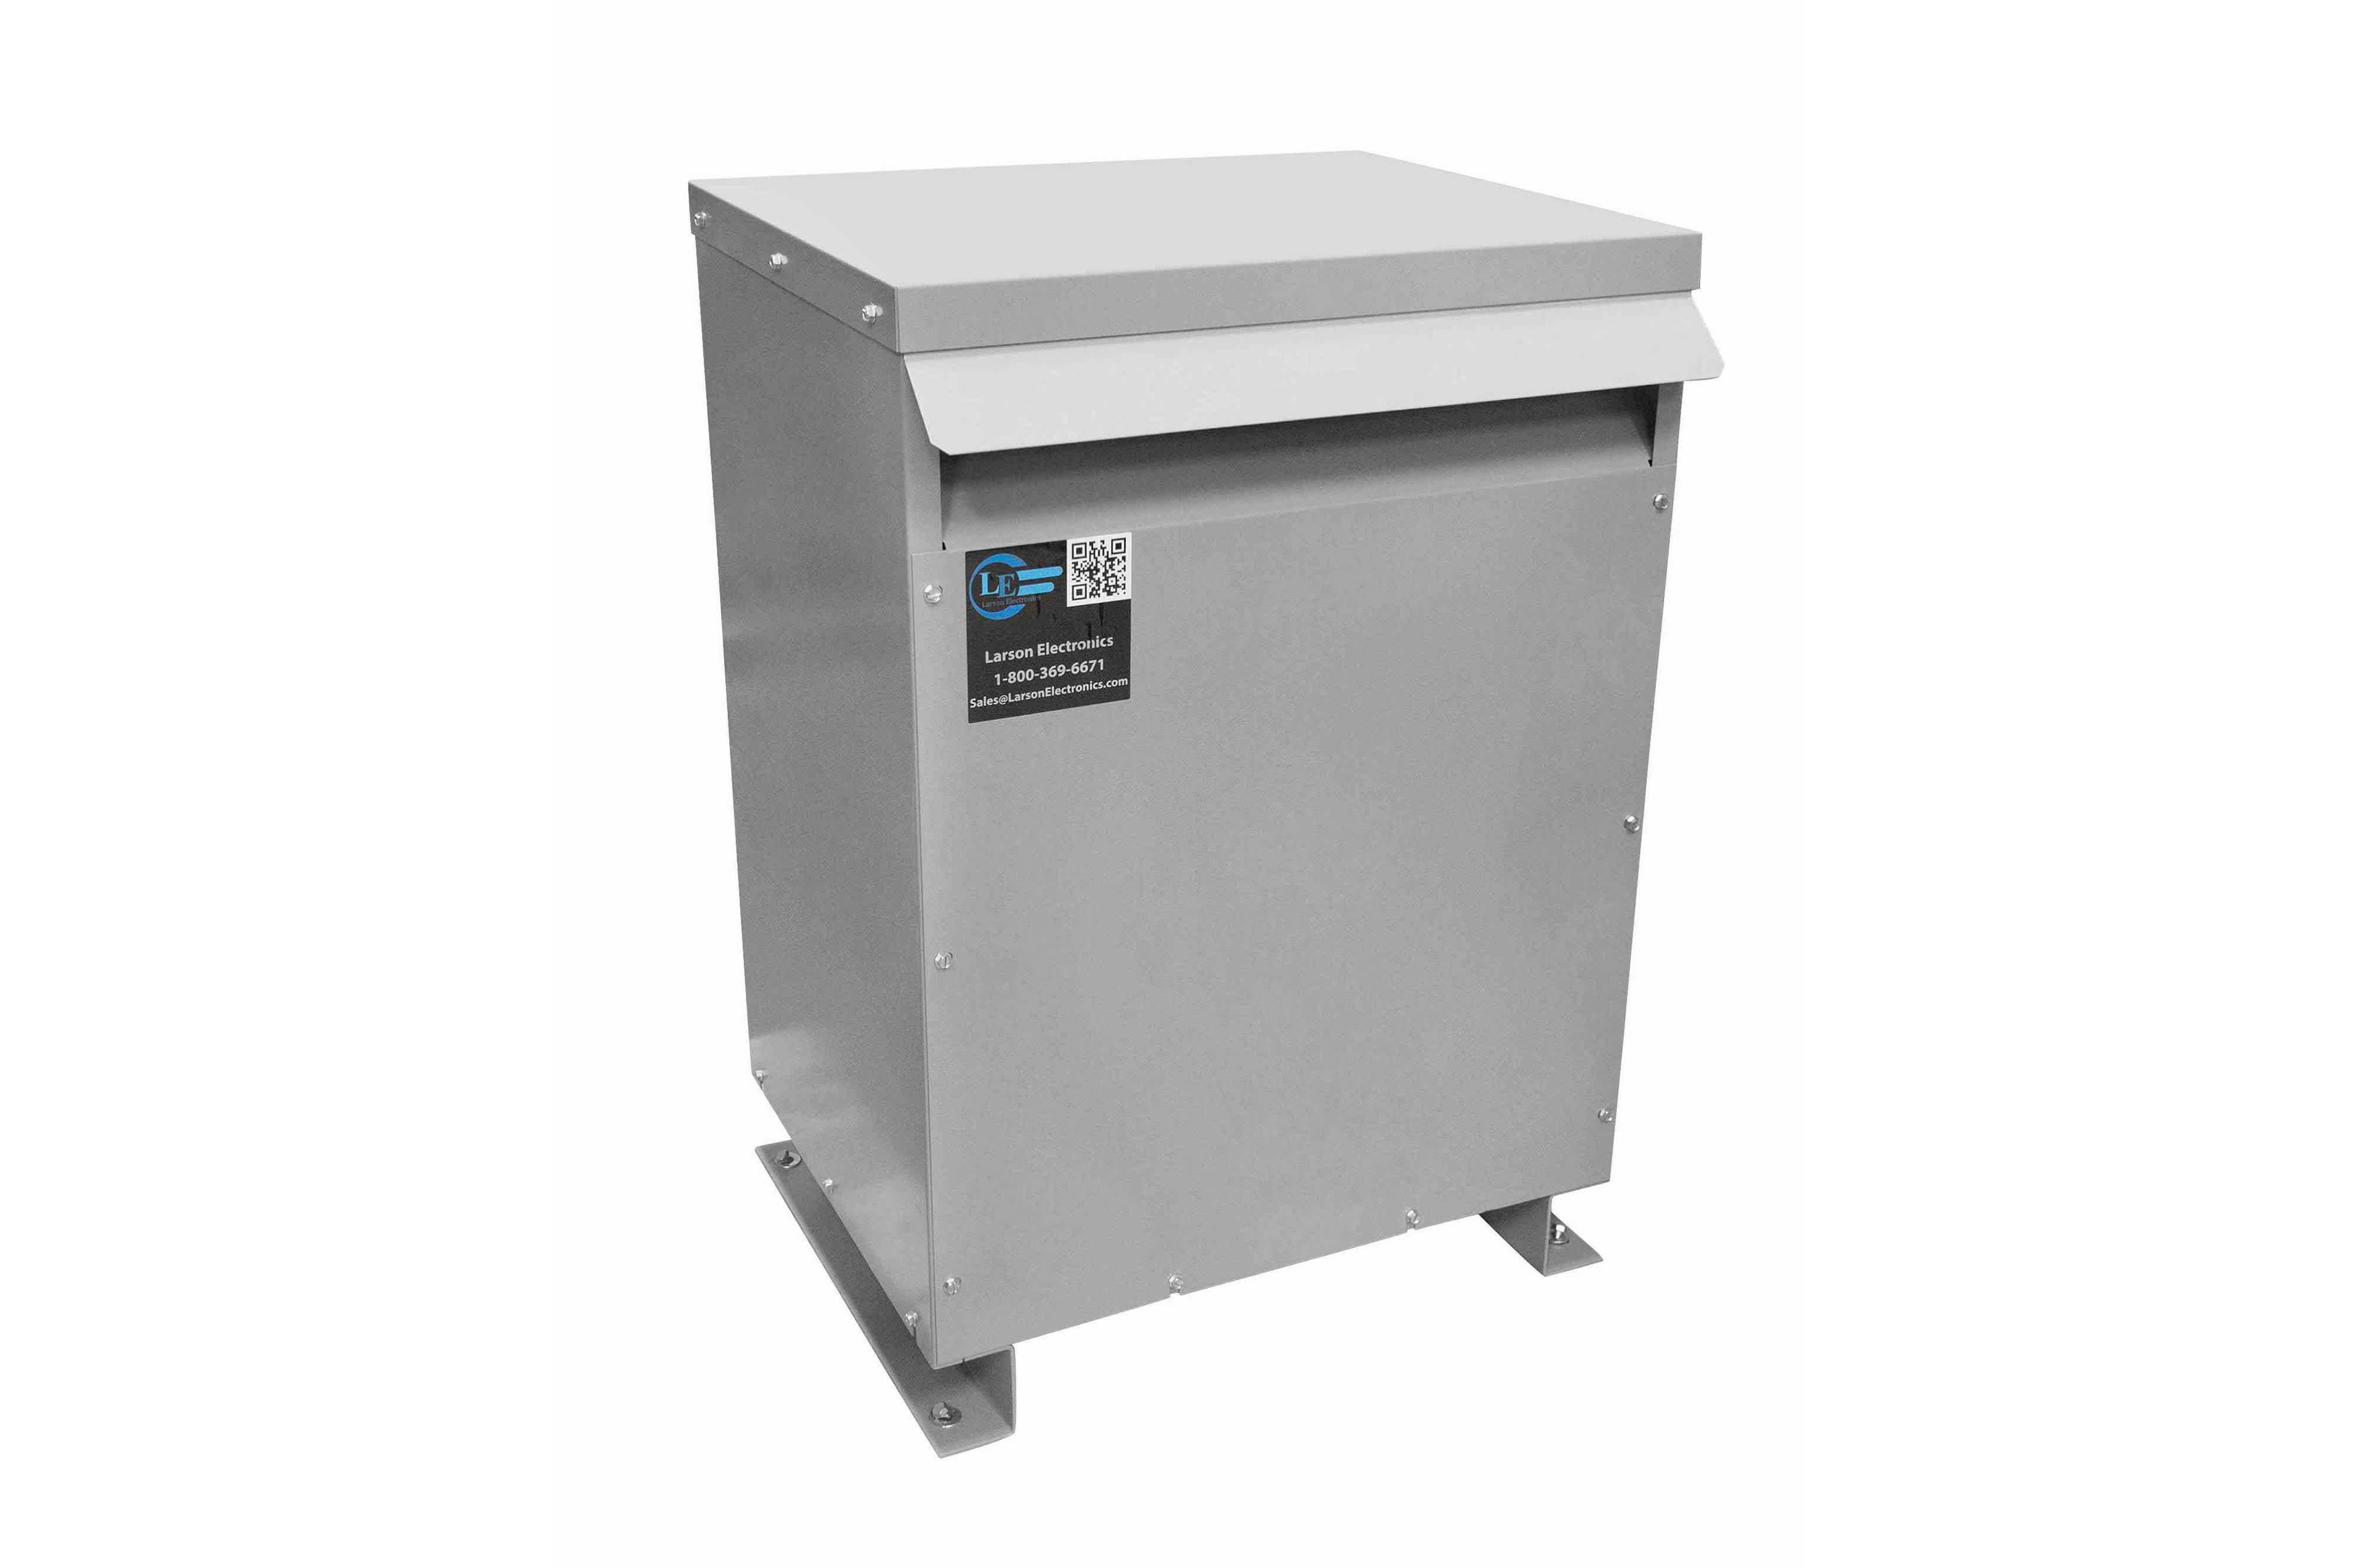 150 kVA 3PH Isolation Transformer, 415V Wye Primary, 600V Delta Secondary, N3R, Ventilated, 60 Hz